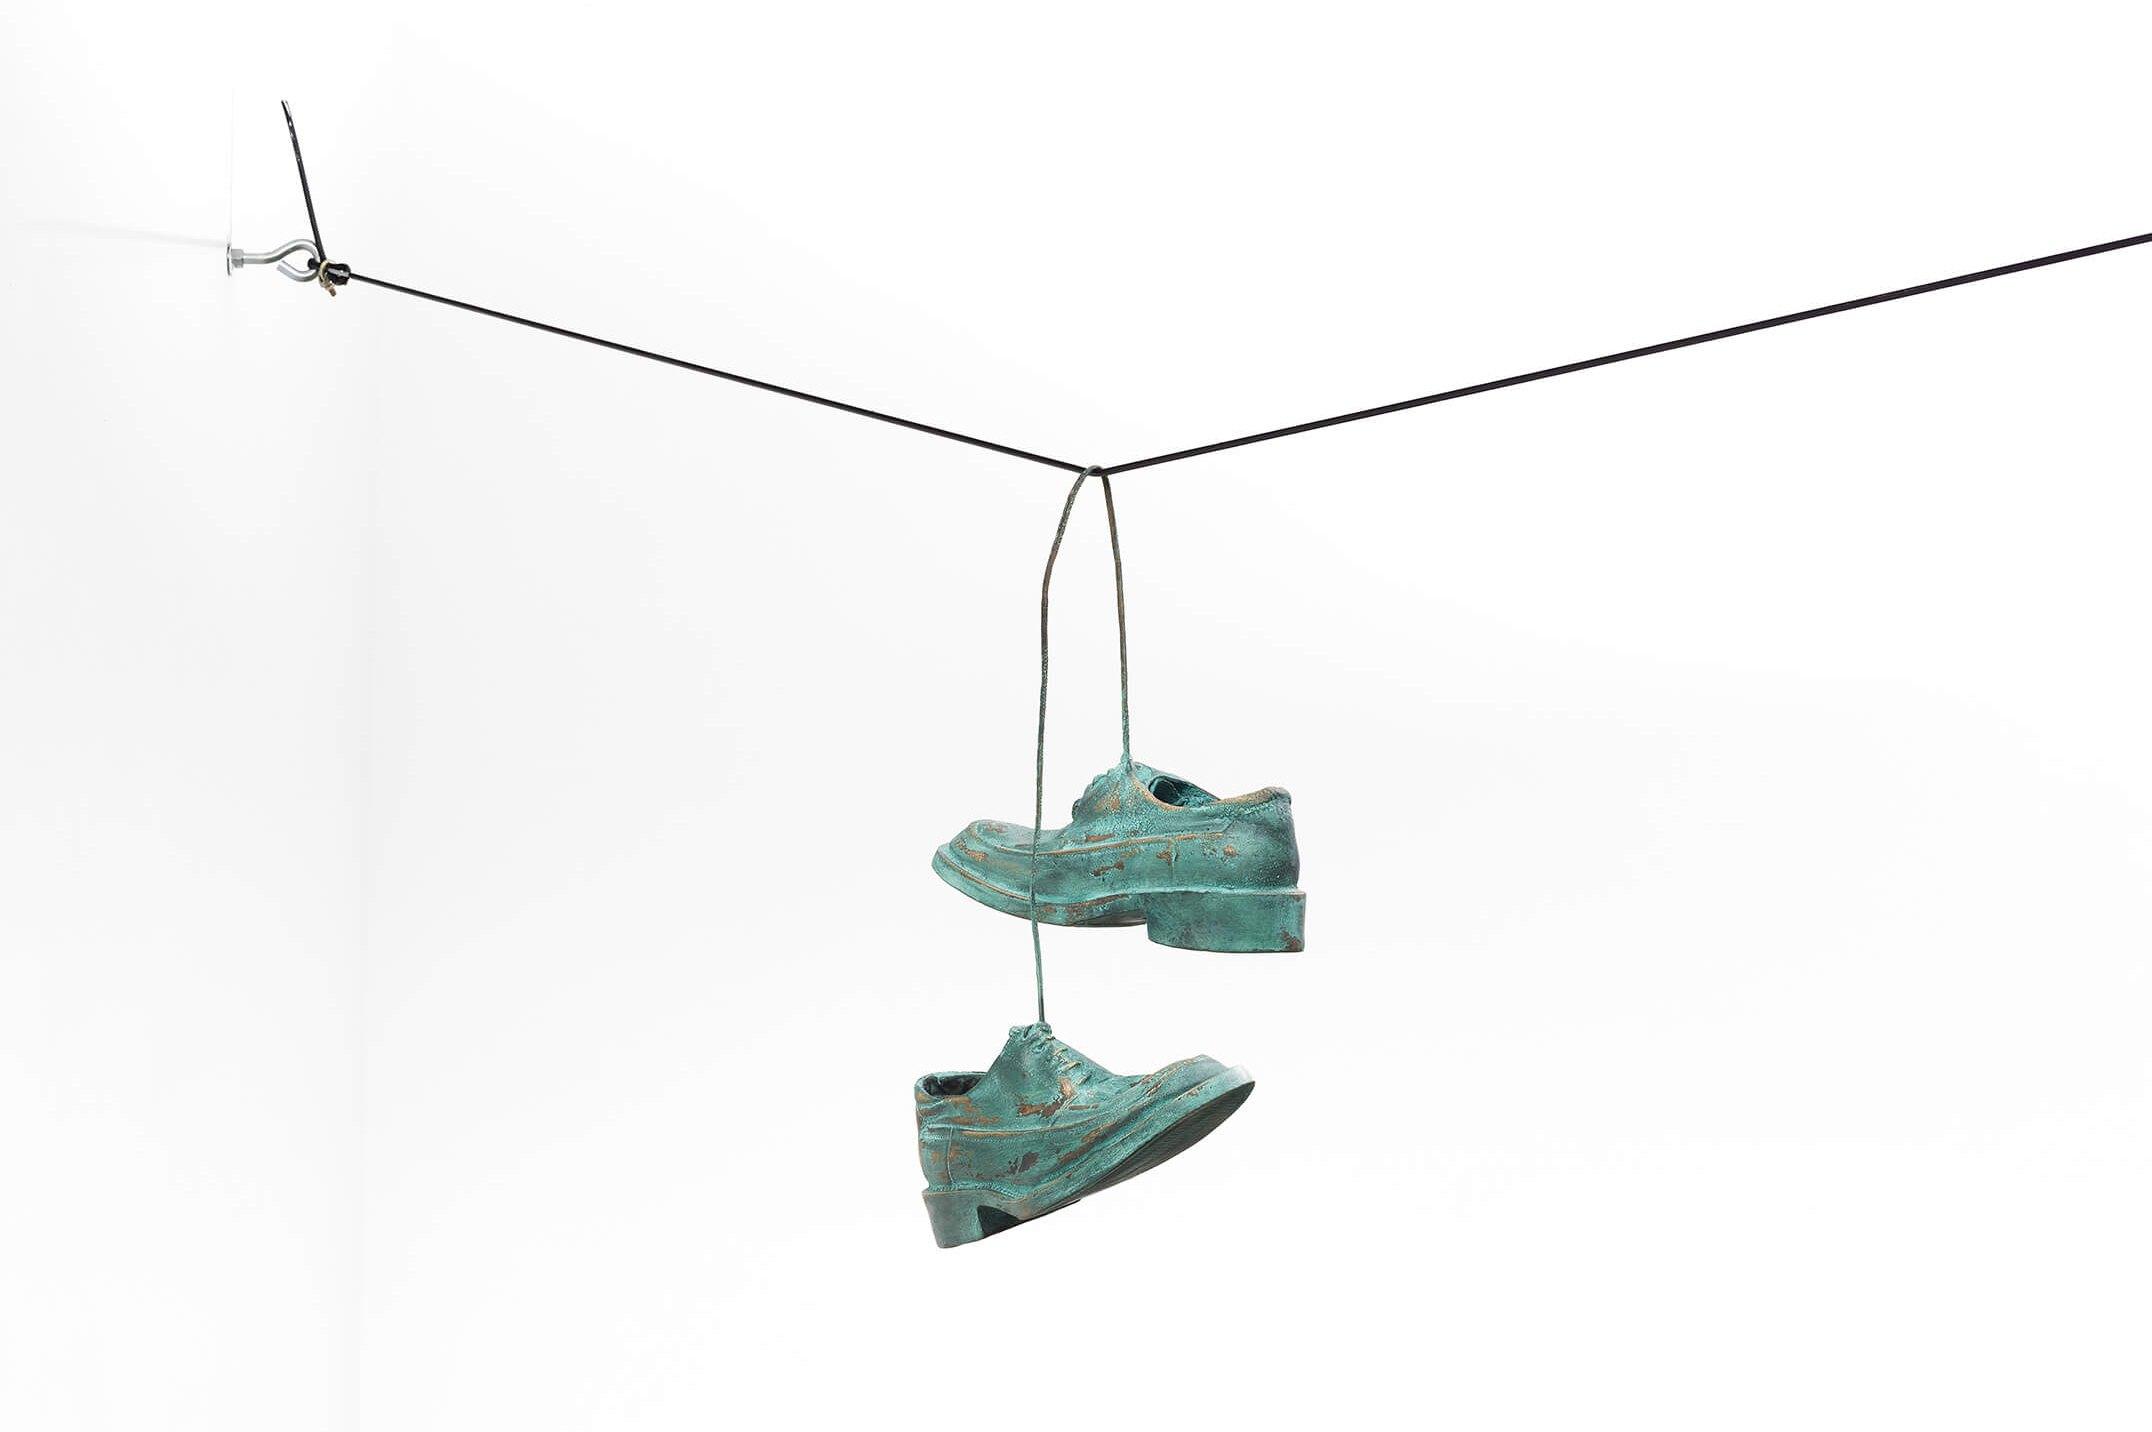 Haroon Gunn-Salie,<em> On the line,</em>2016,pair of shoes bronze plated,46 × 32 × 18 cm - Mendes Wood DM